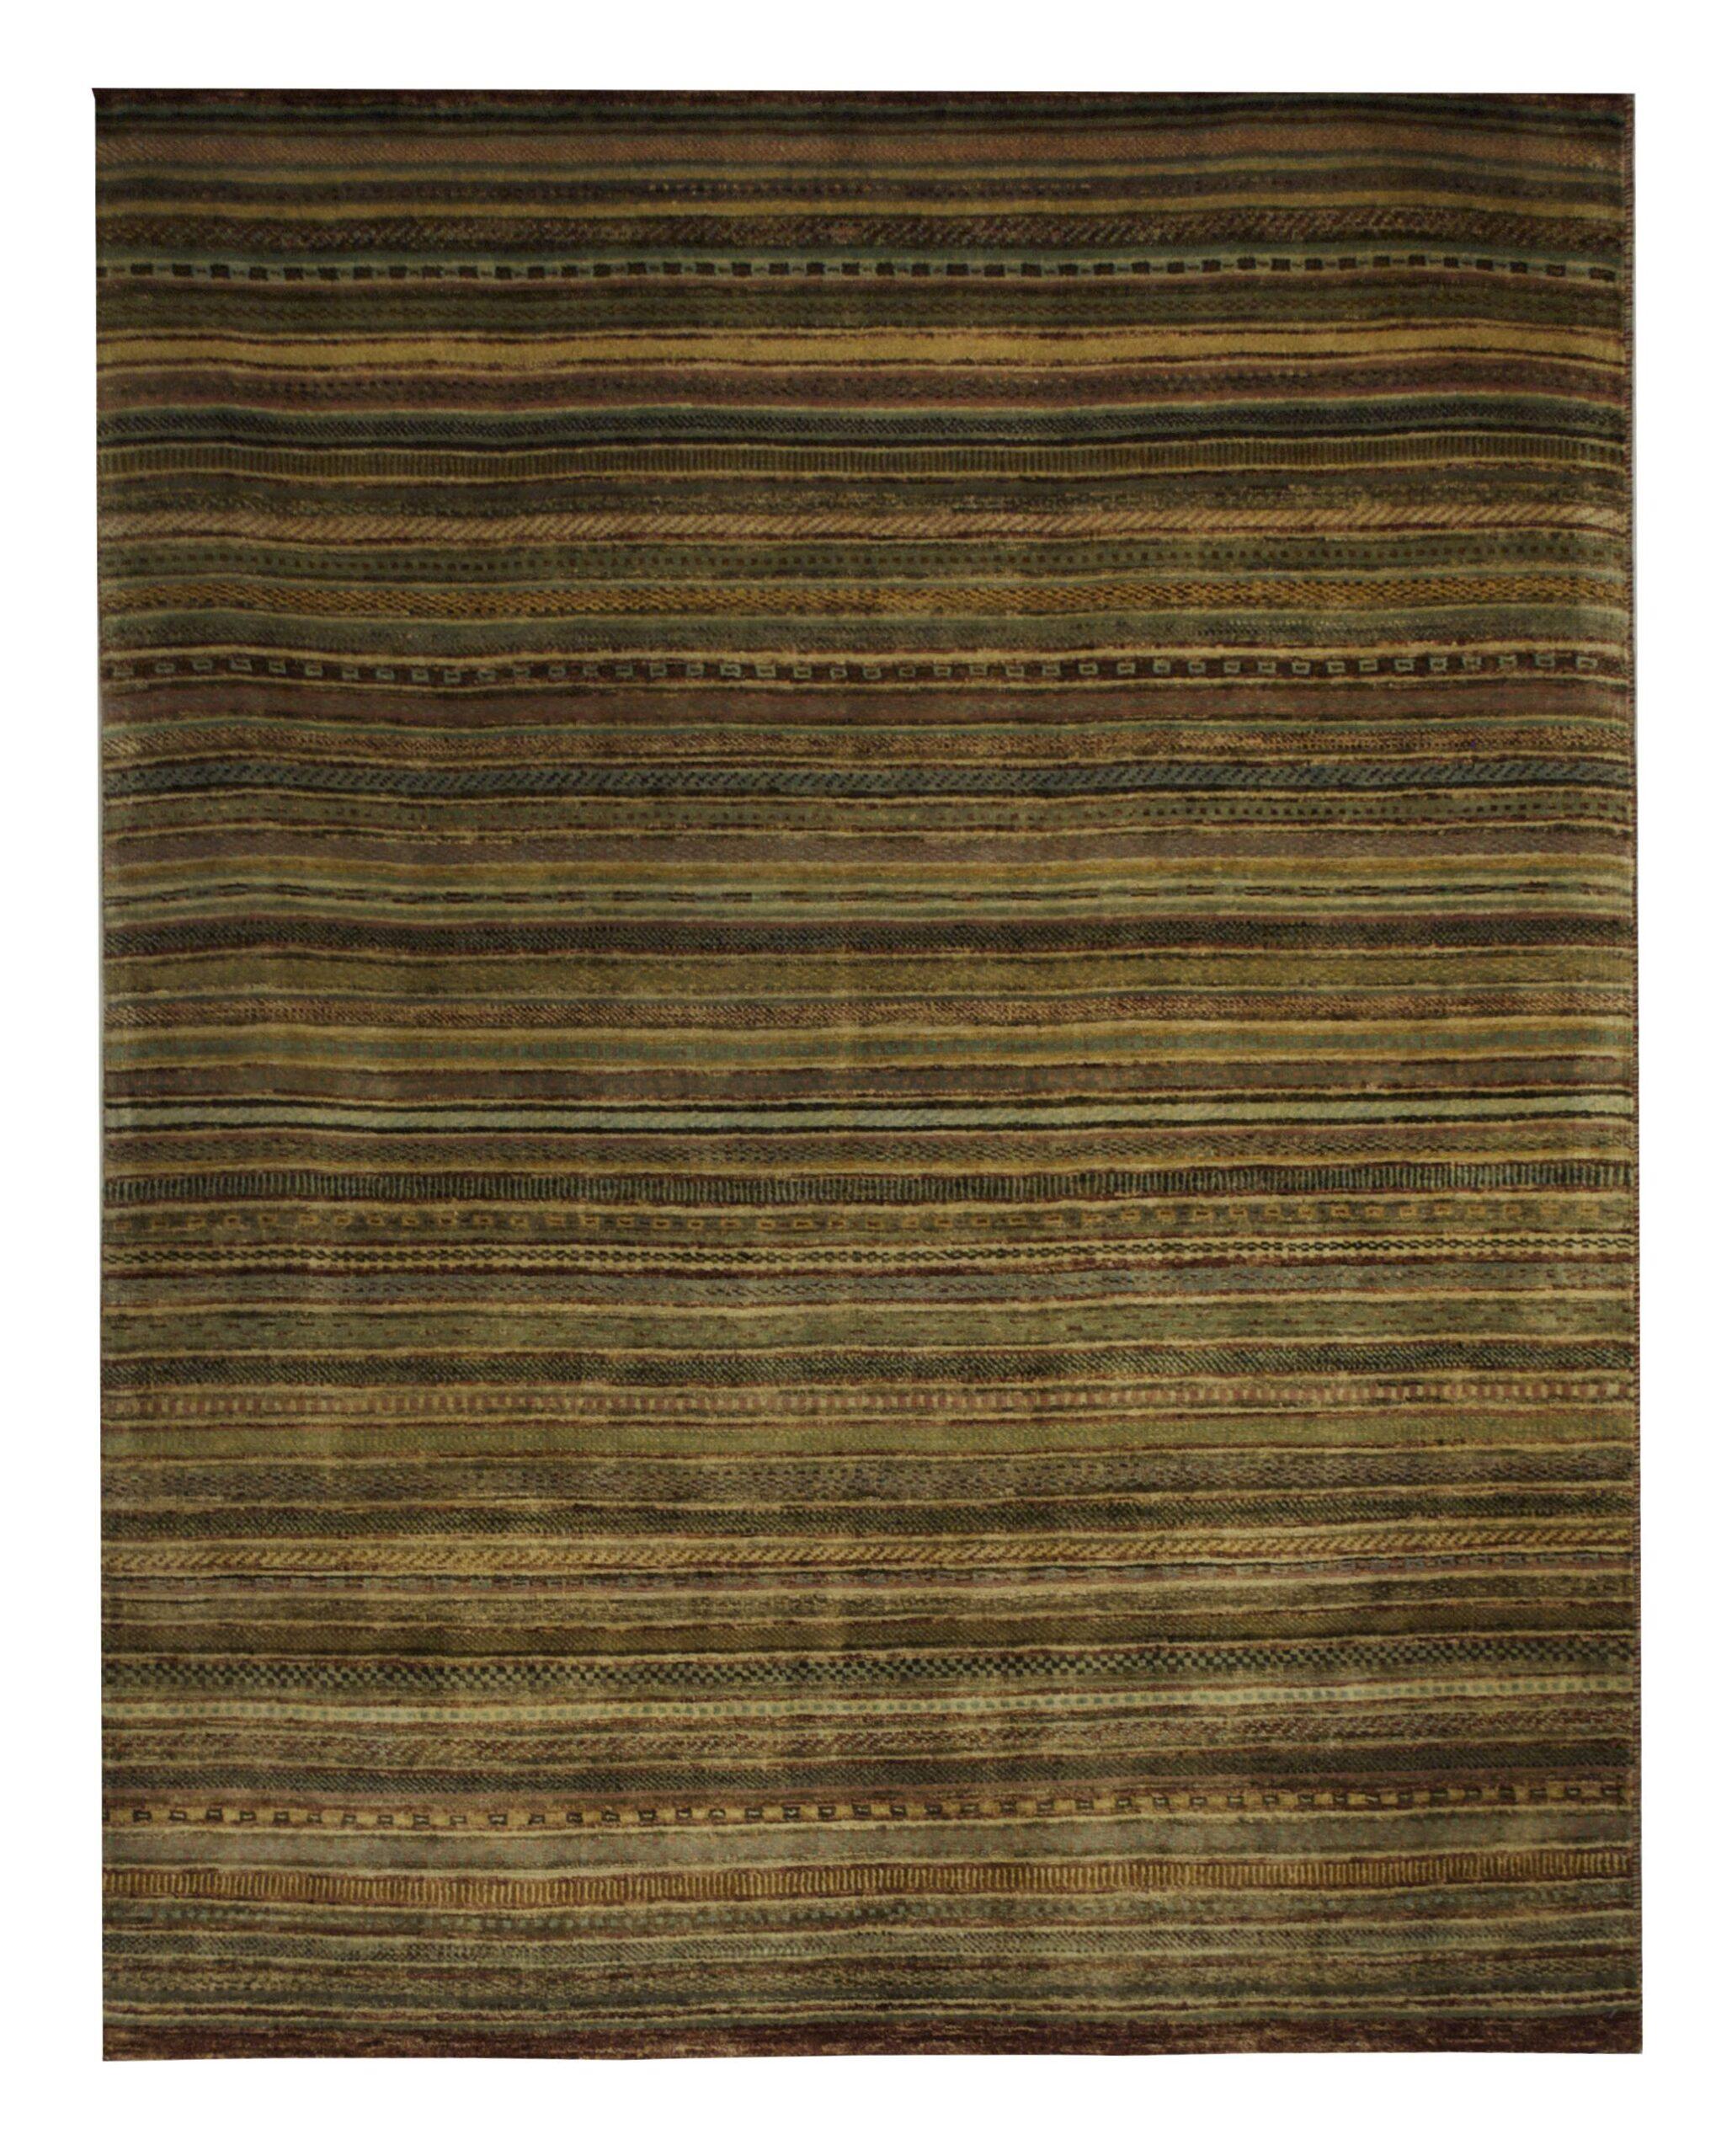 "Gabbeh 4' 6"" x 5' 10"" Wool Handmade Area Rug - Shabahang Royal Carpet"